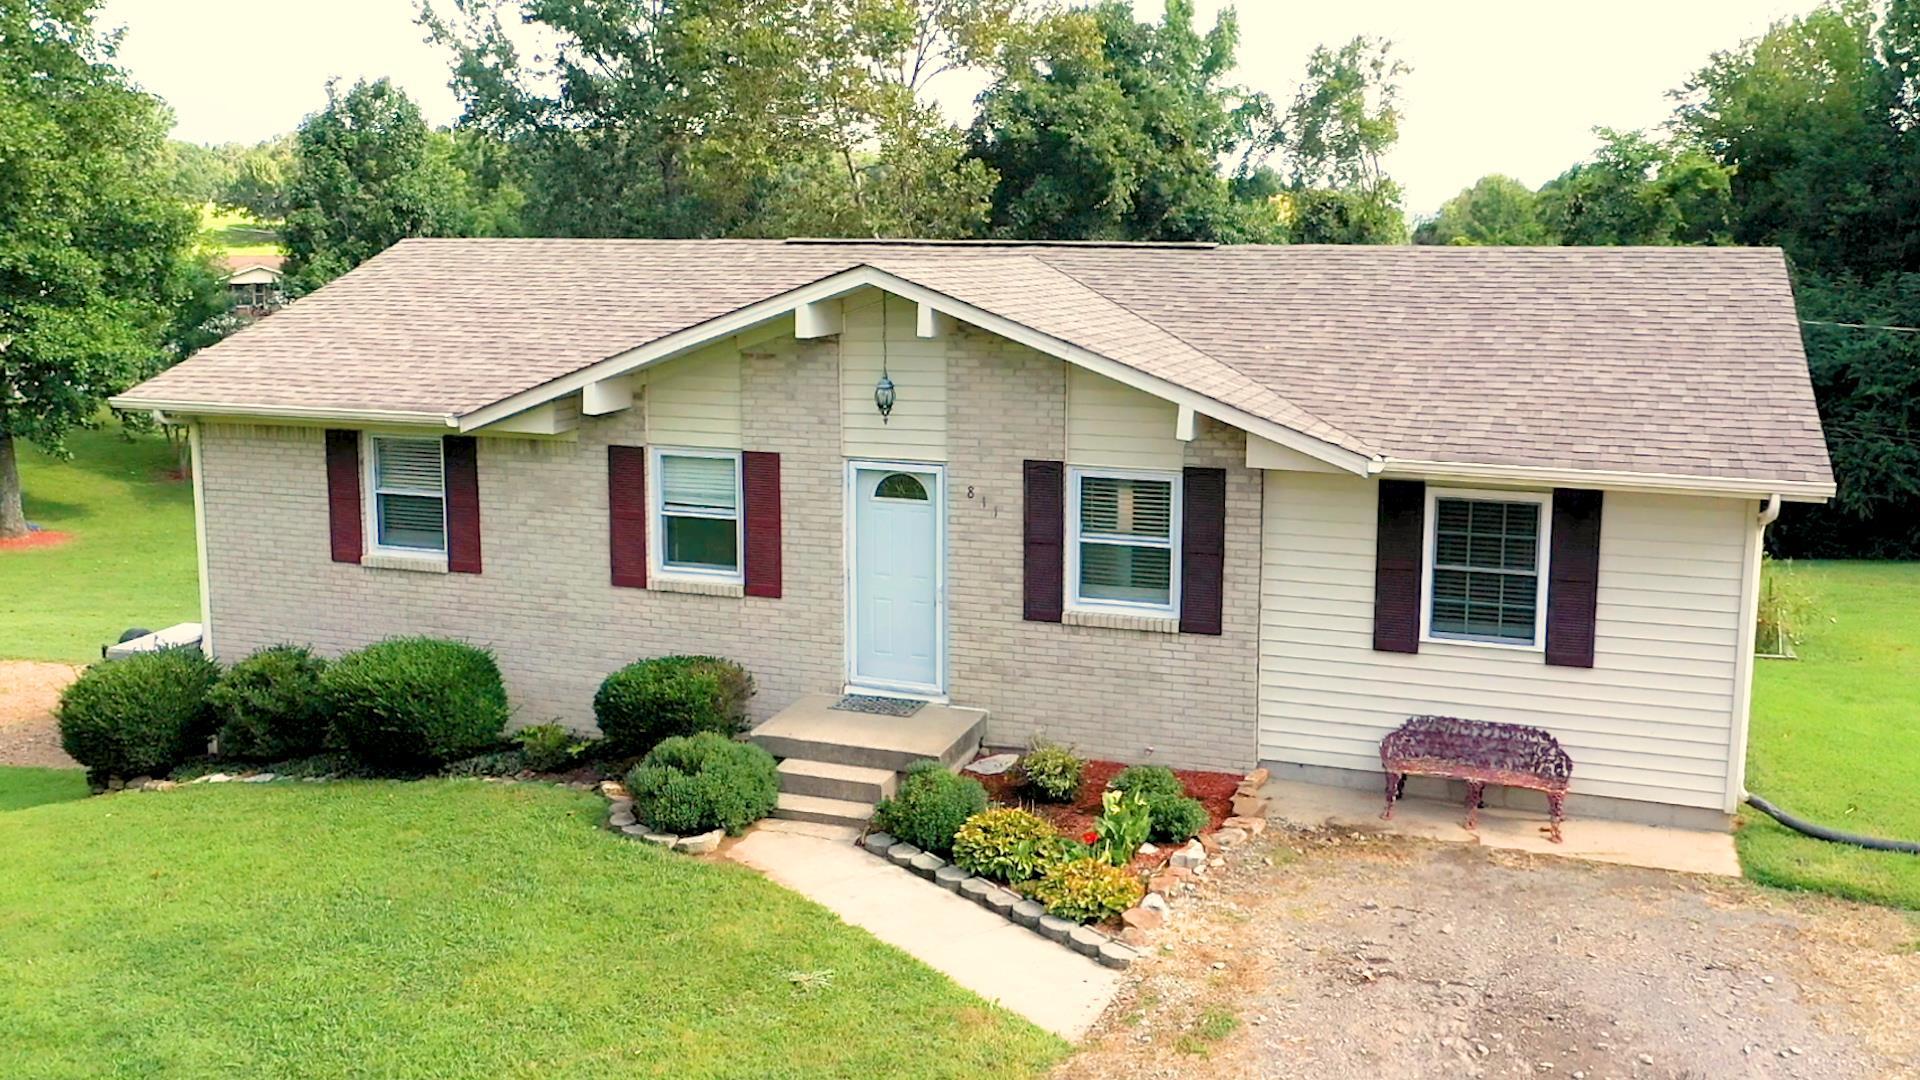 811 Daisy Circle Rd, Cumberland Furnace, TN 37051 - Cumberland Furnace, TN real estate listing